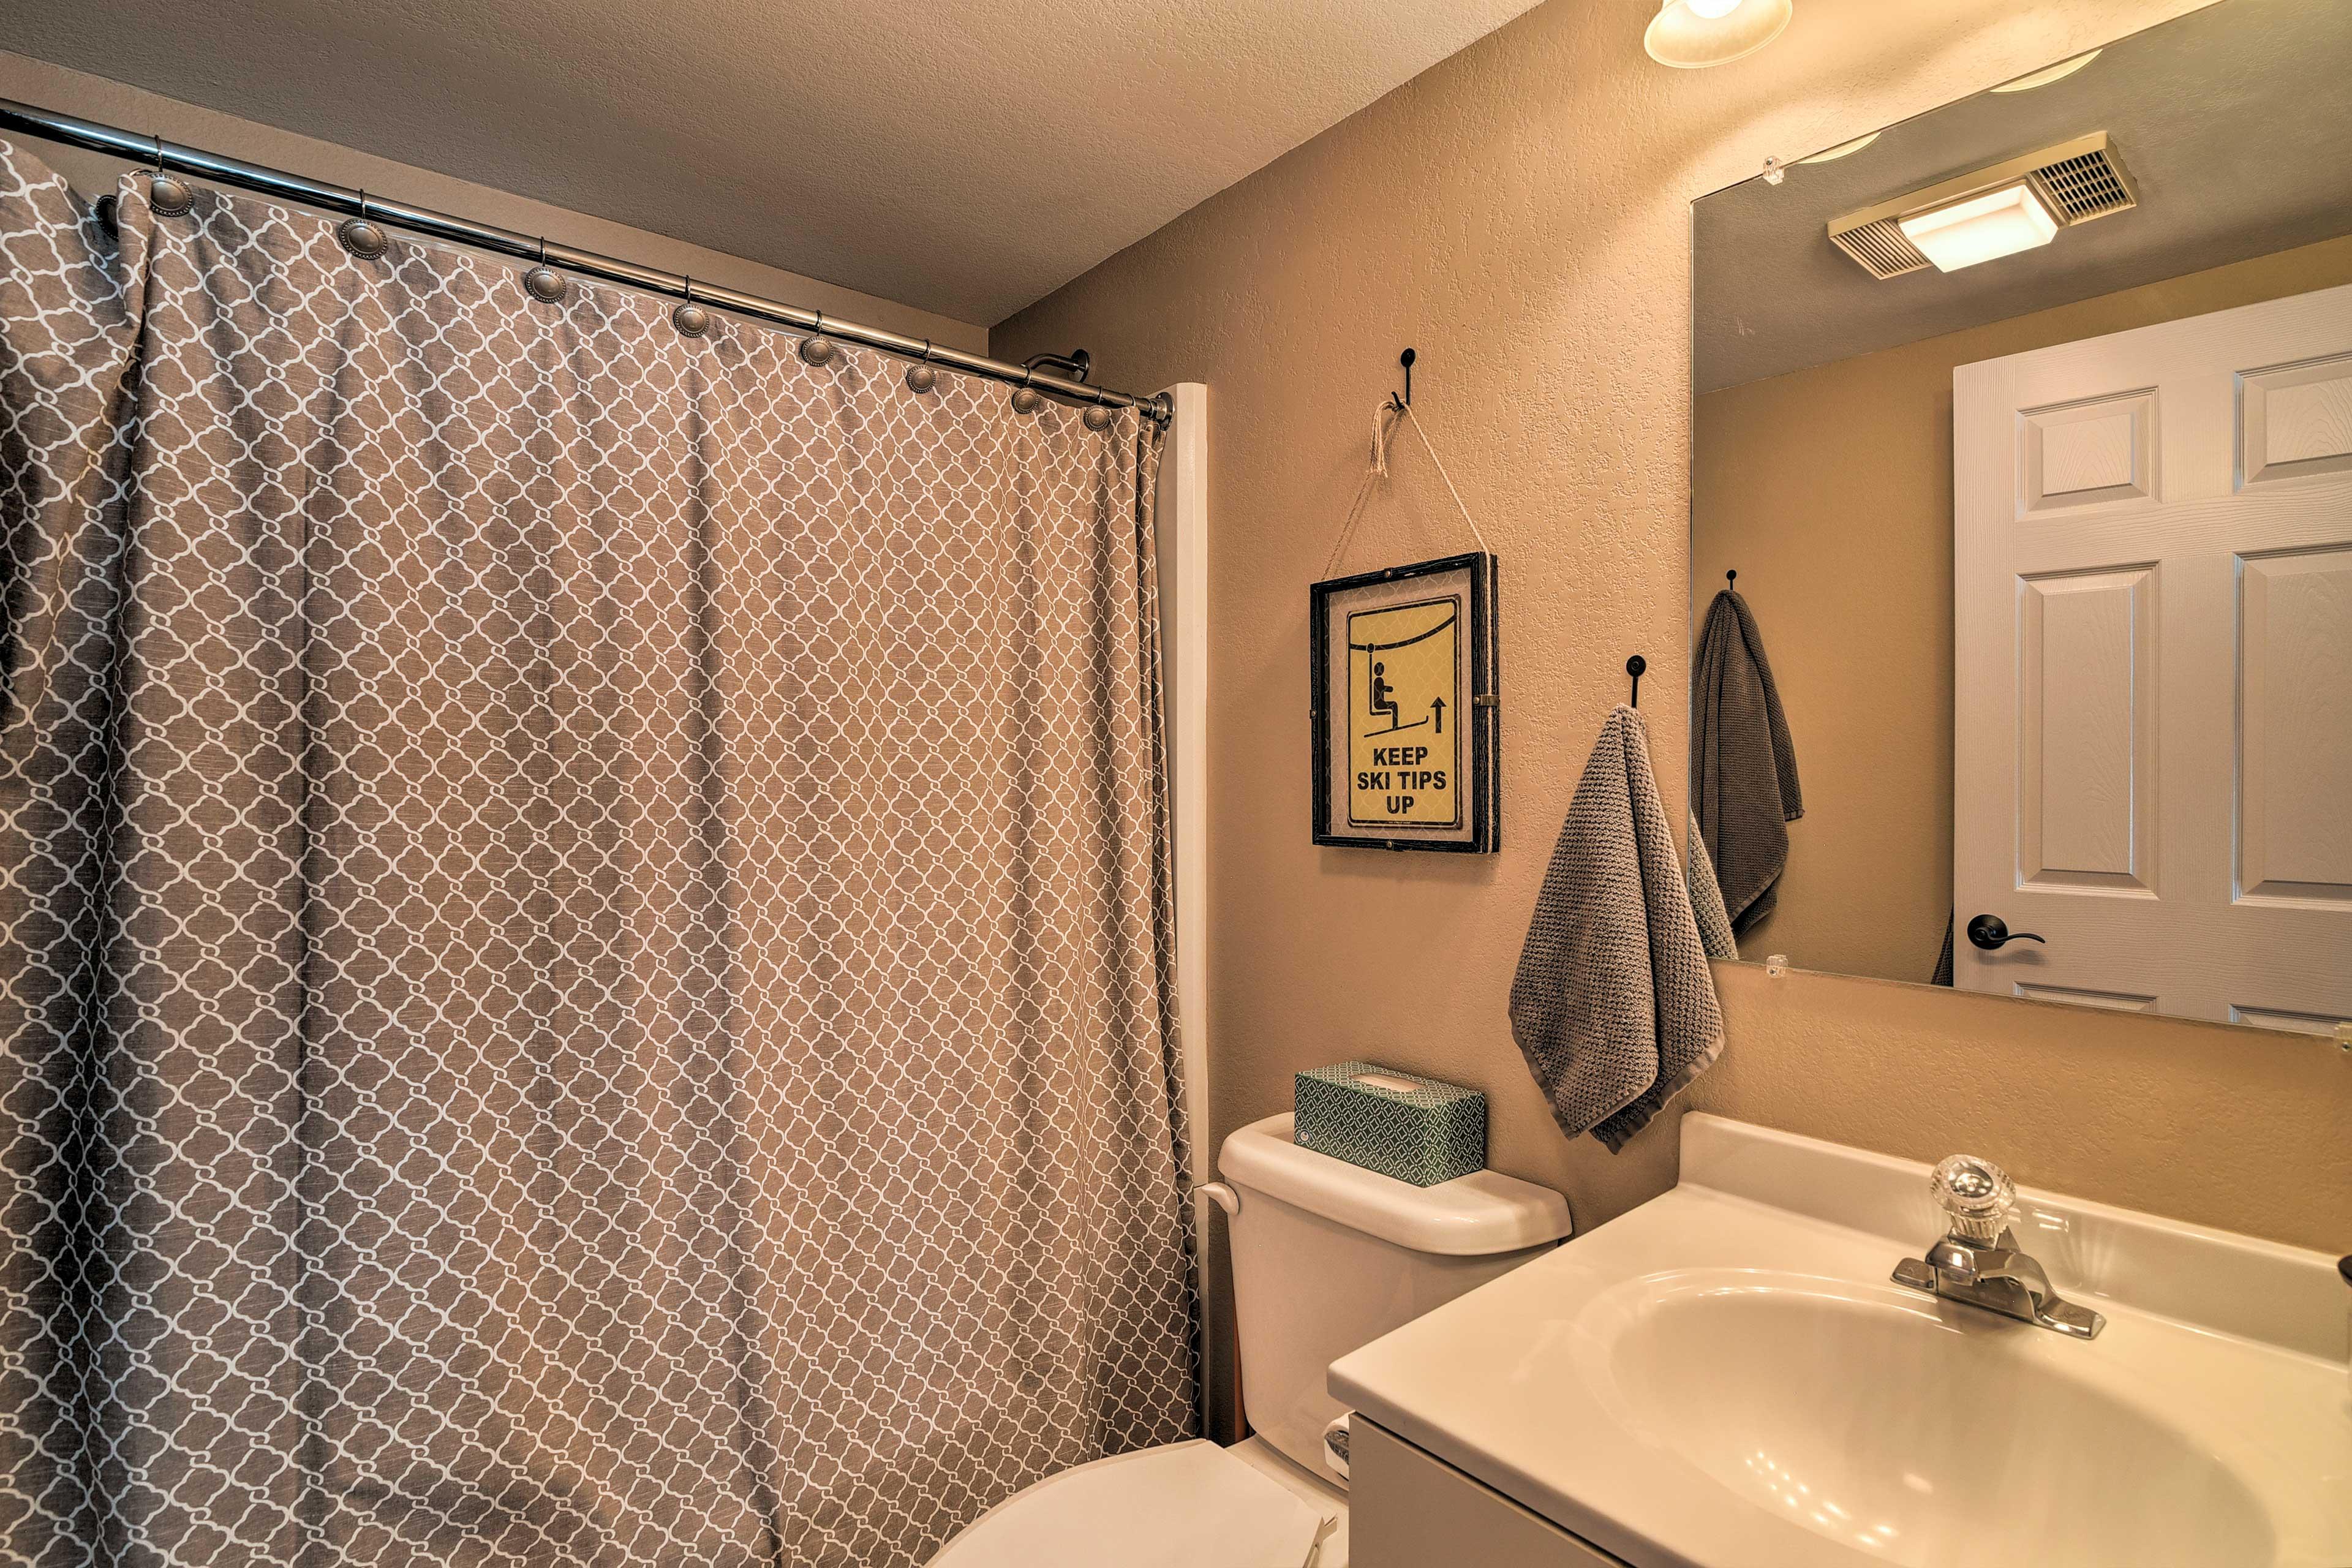 Enjoy the convenience of this full en-suite bathroom.